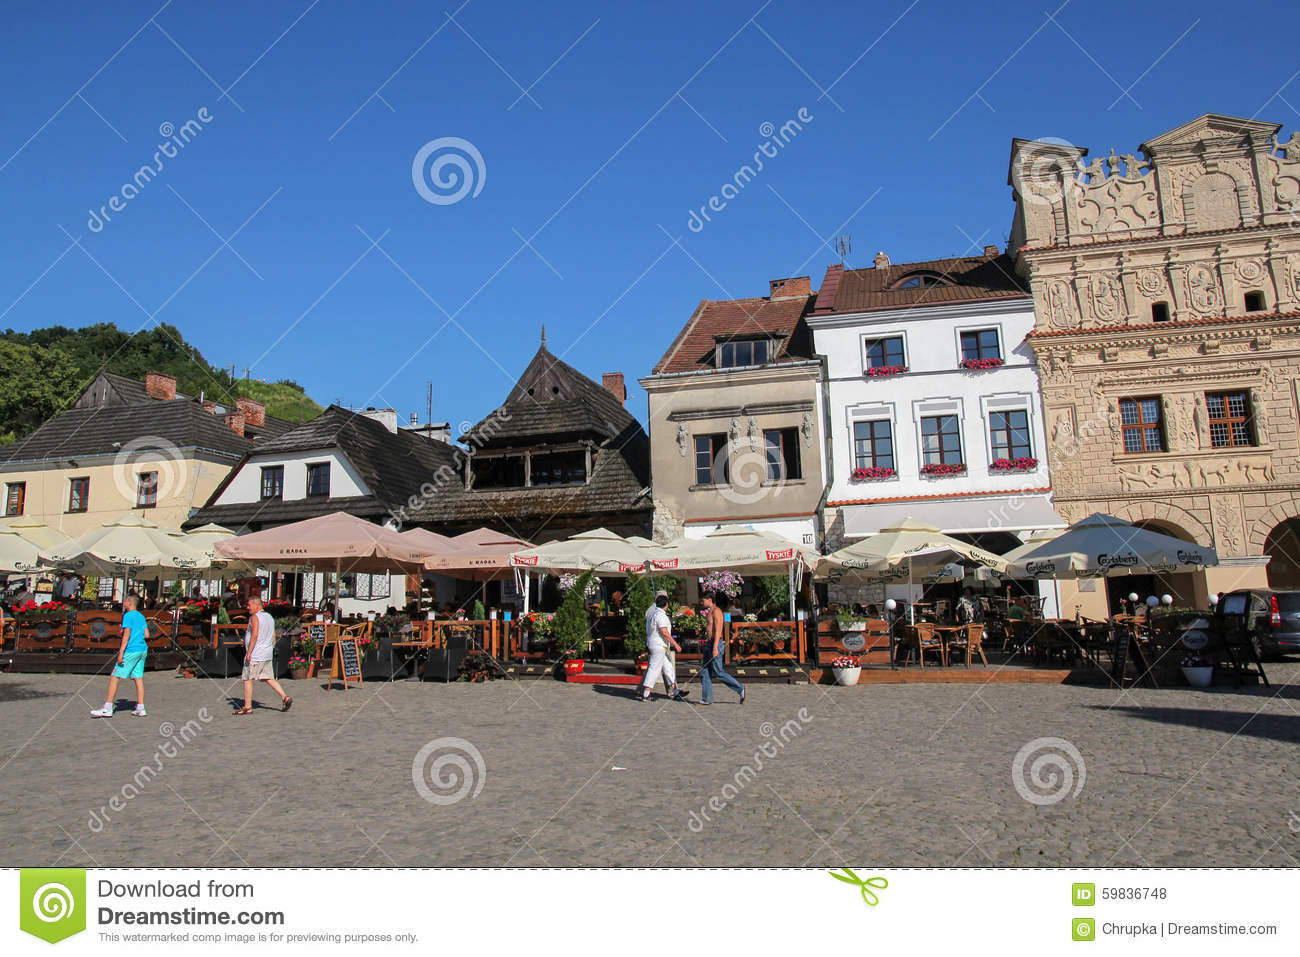 Restaurants On The Market Square In Kazimierz Dolny, Poland.